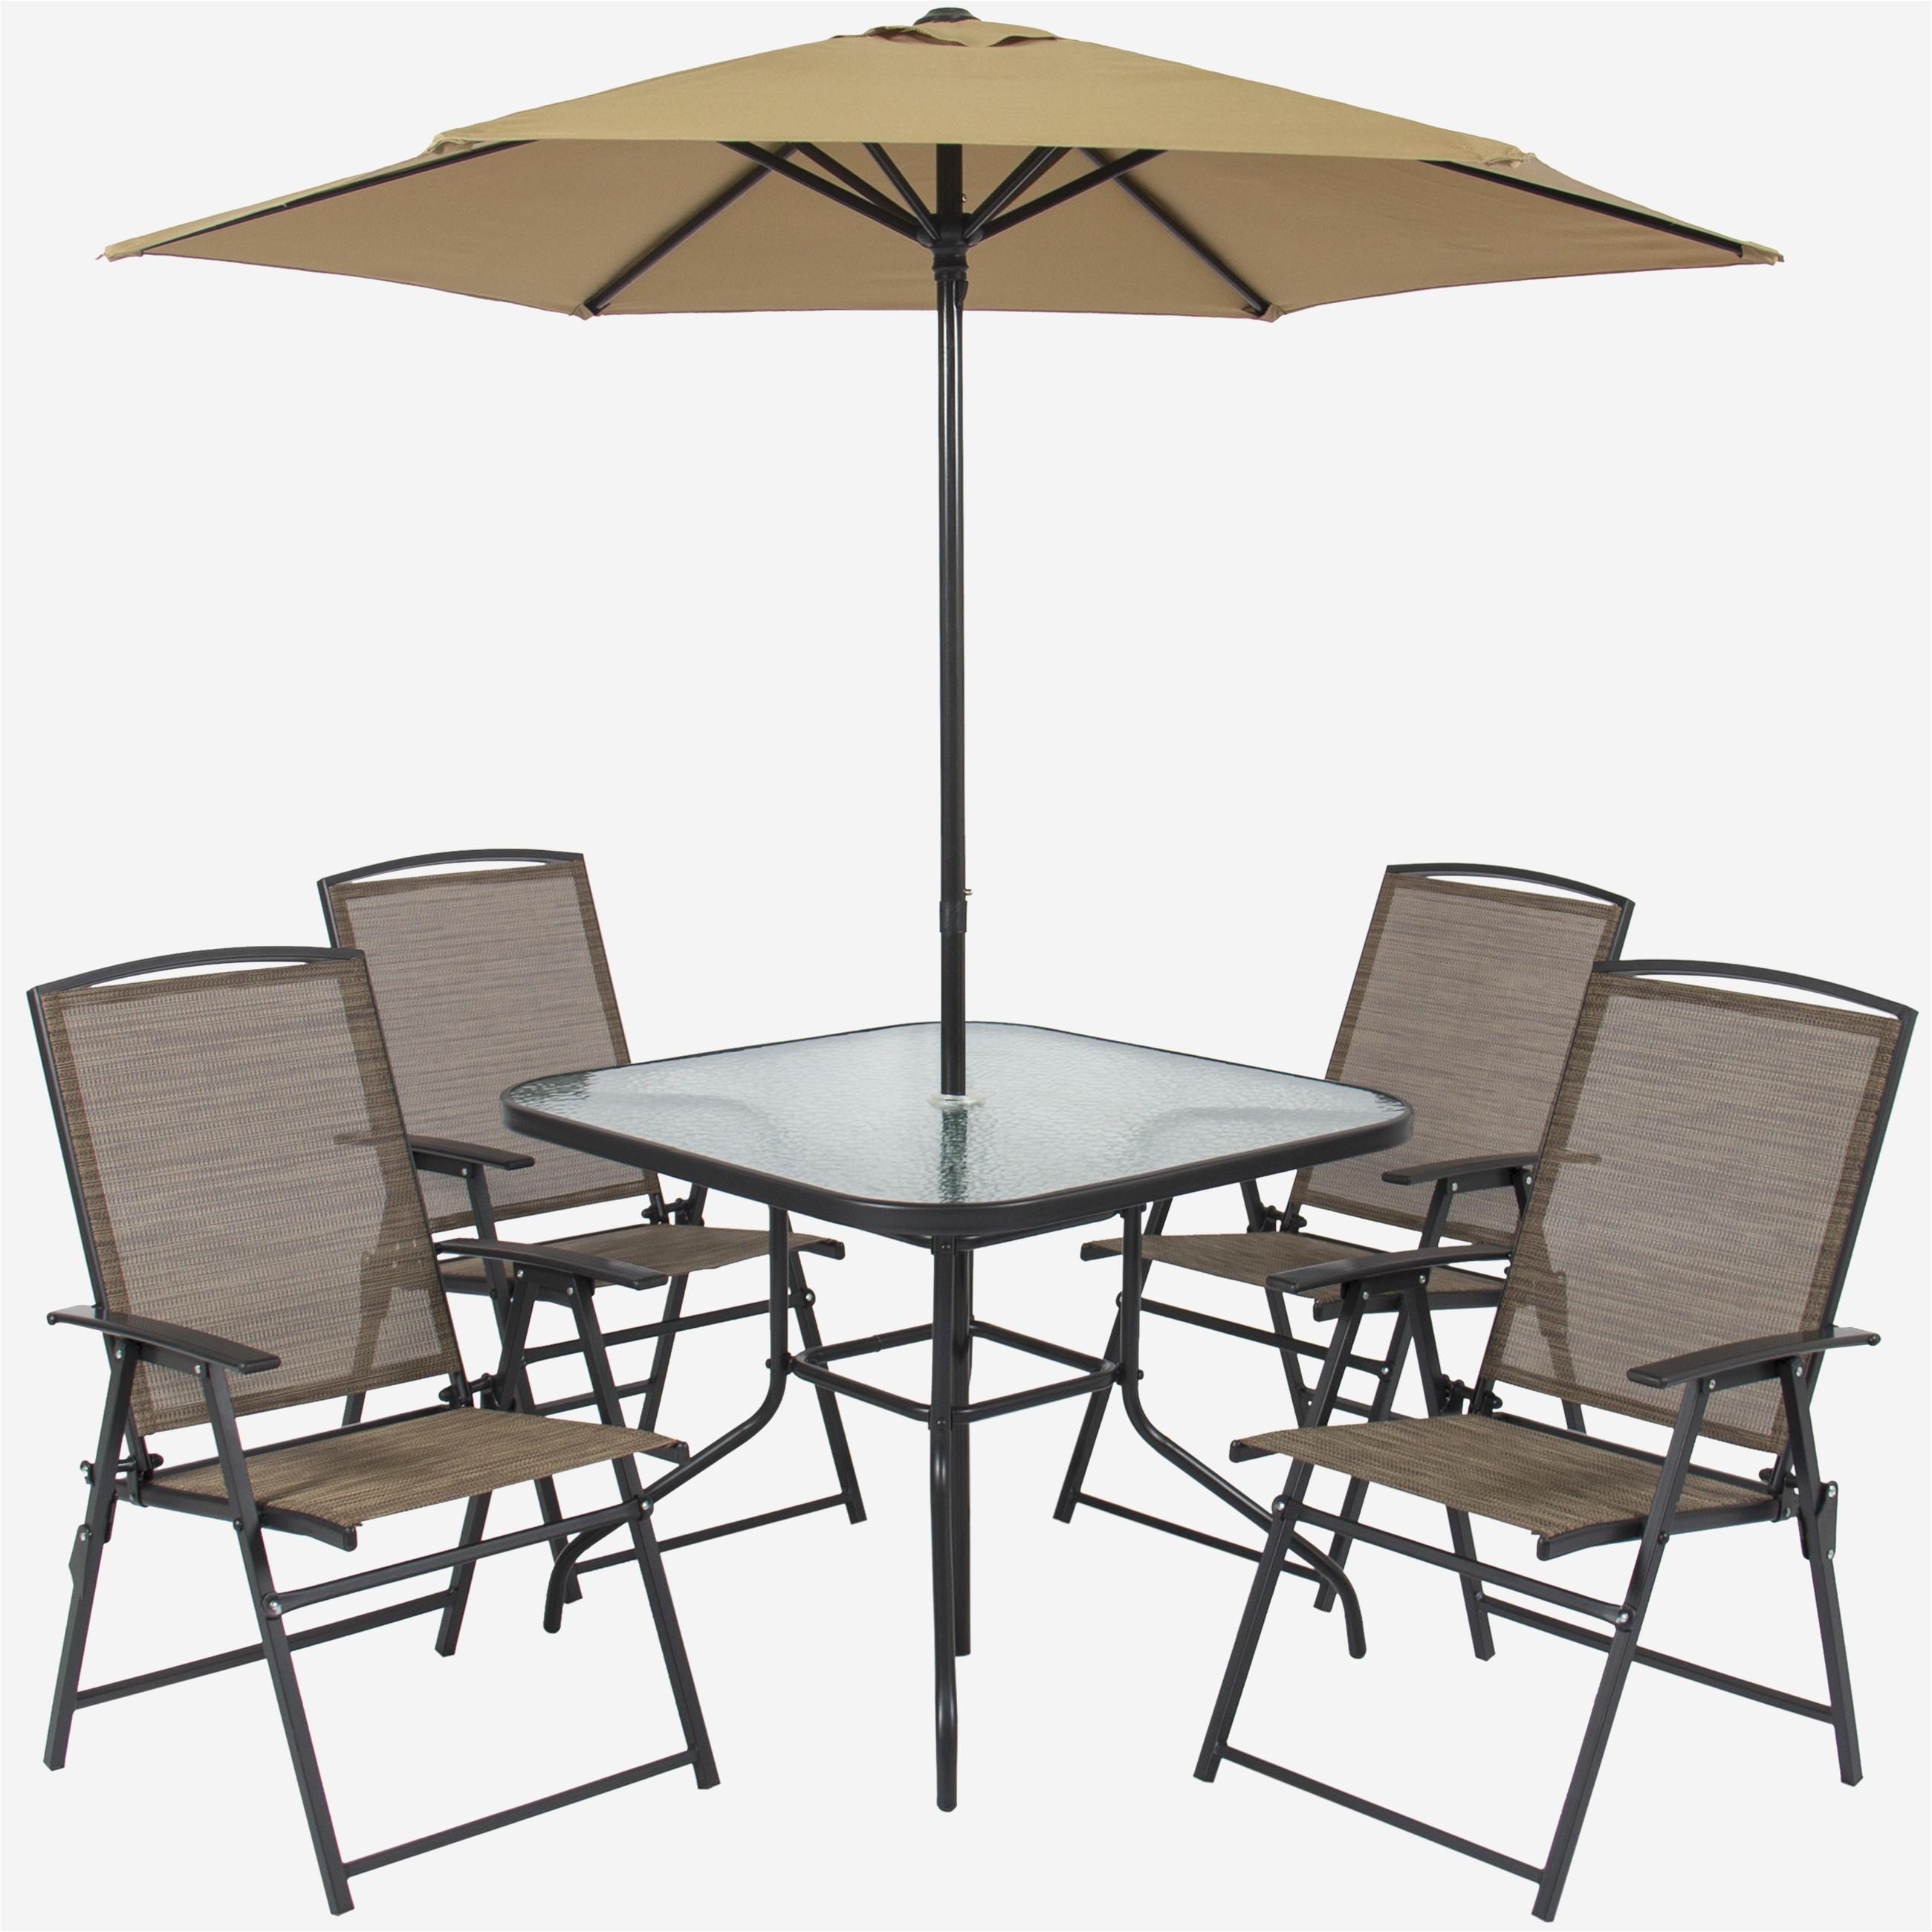 Morrisons Garden Table And Chairs Set: Morrisons Children's Patio Set • Patio Ideas